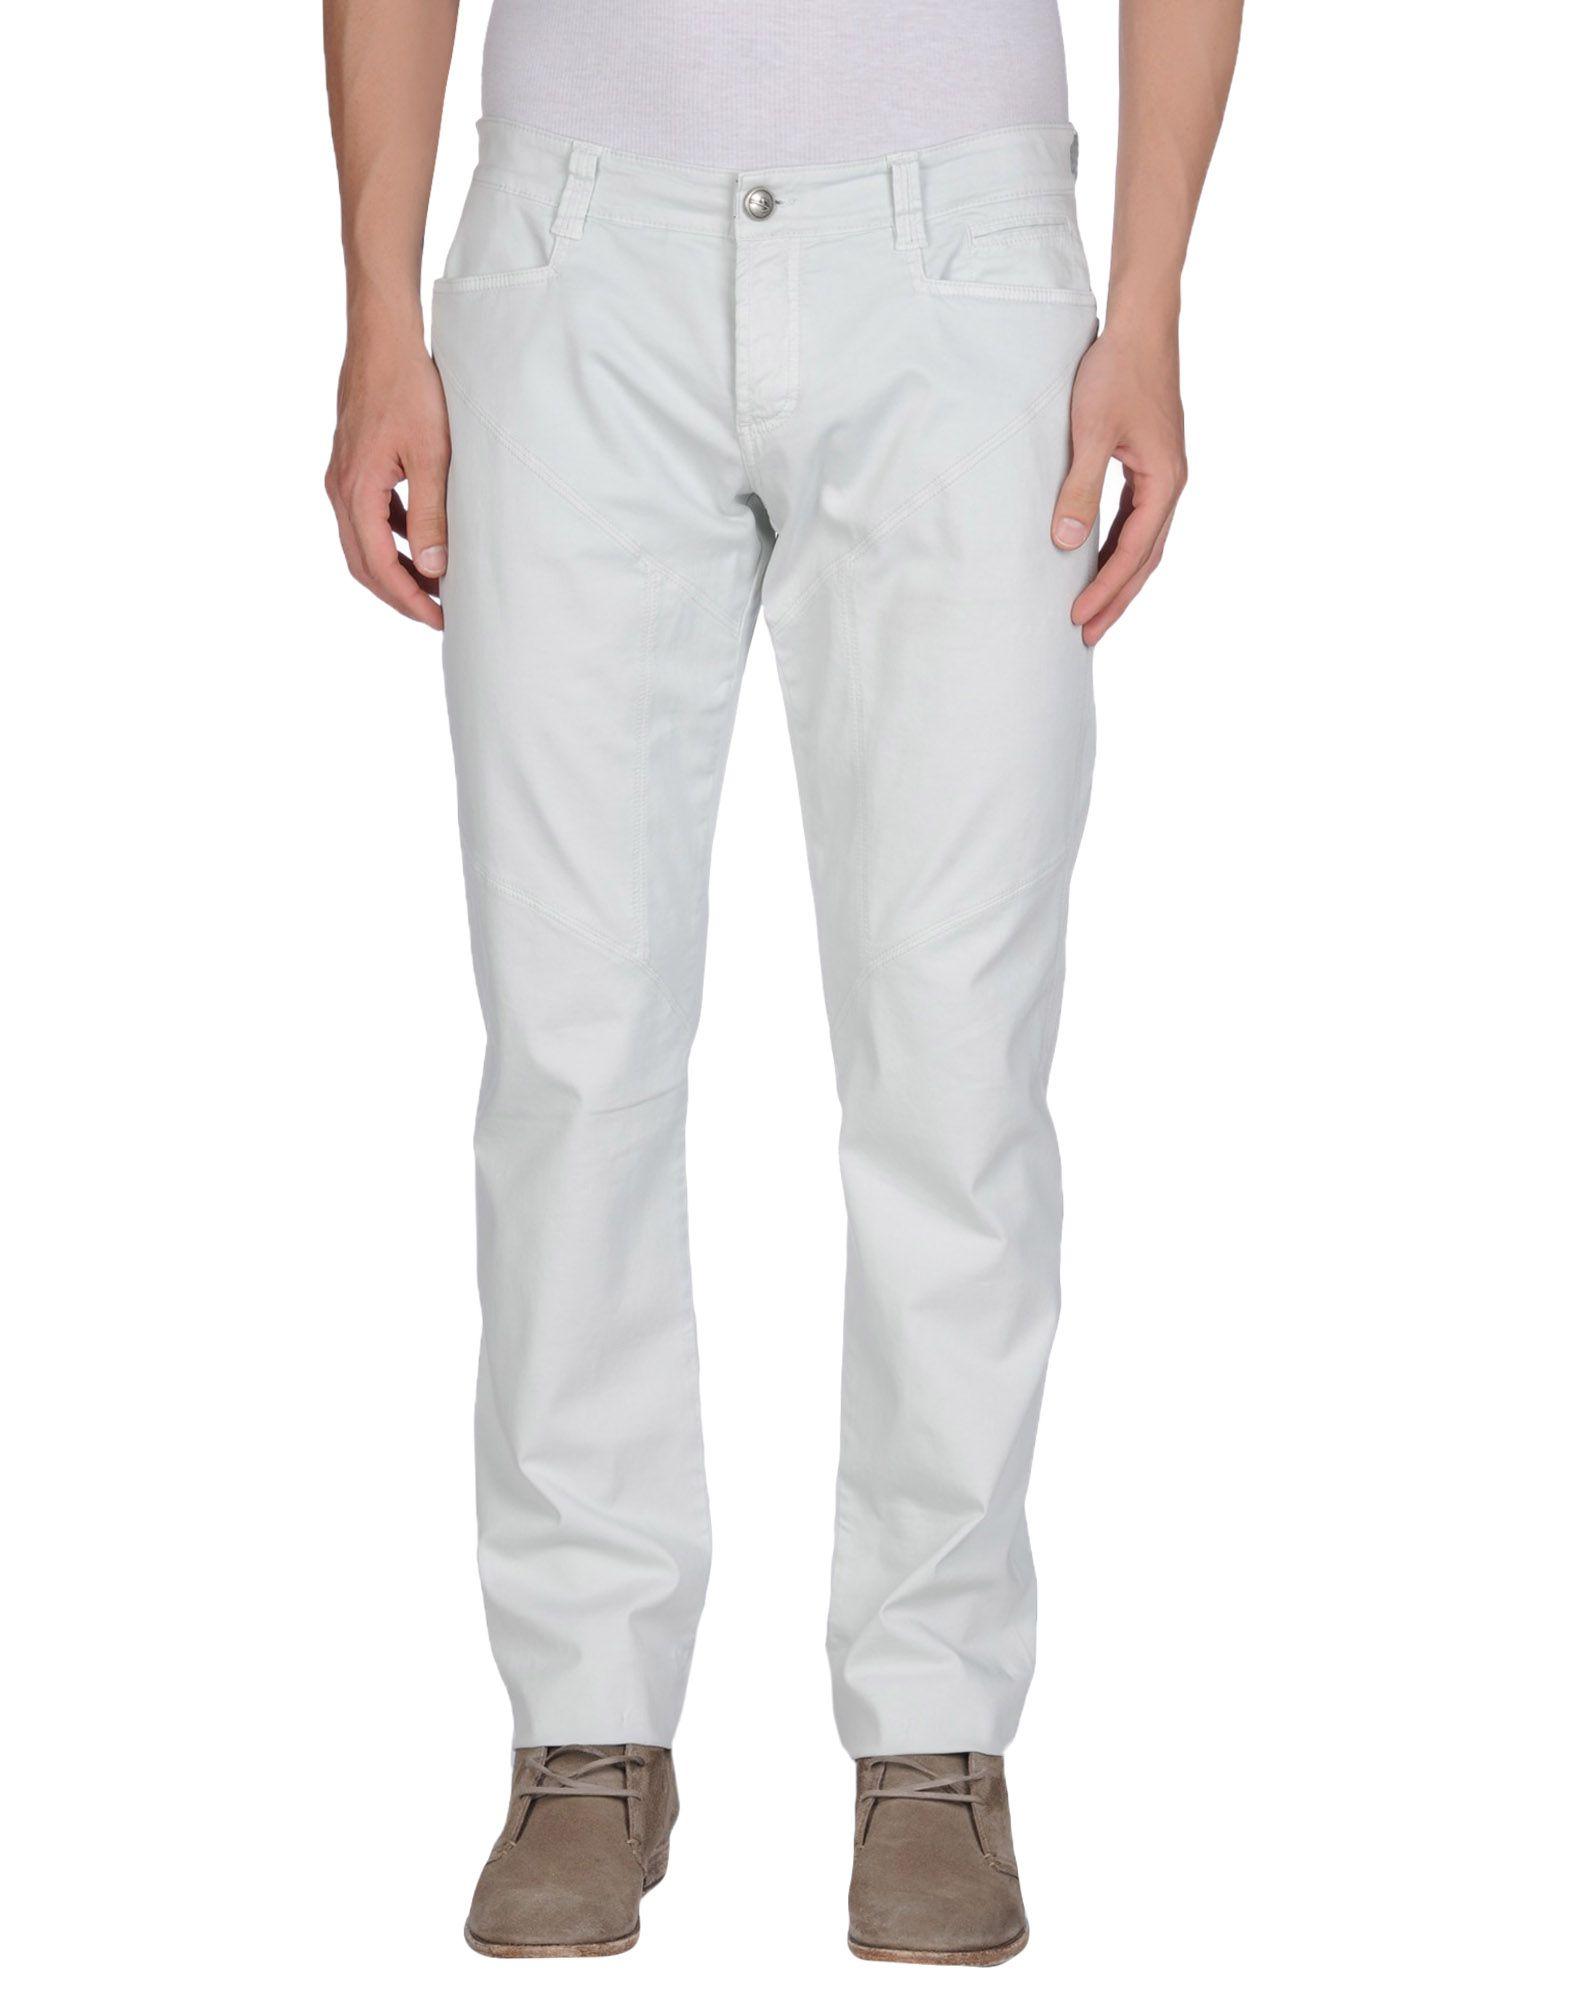 Pantalone 9.2 9.2 9.2 By Carlo  onna uomo - 36681415TE 53f